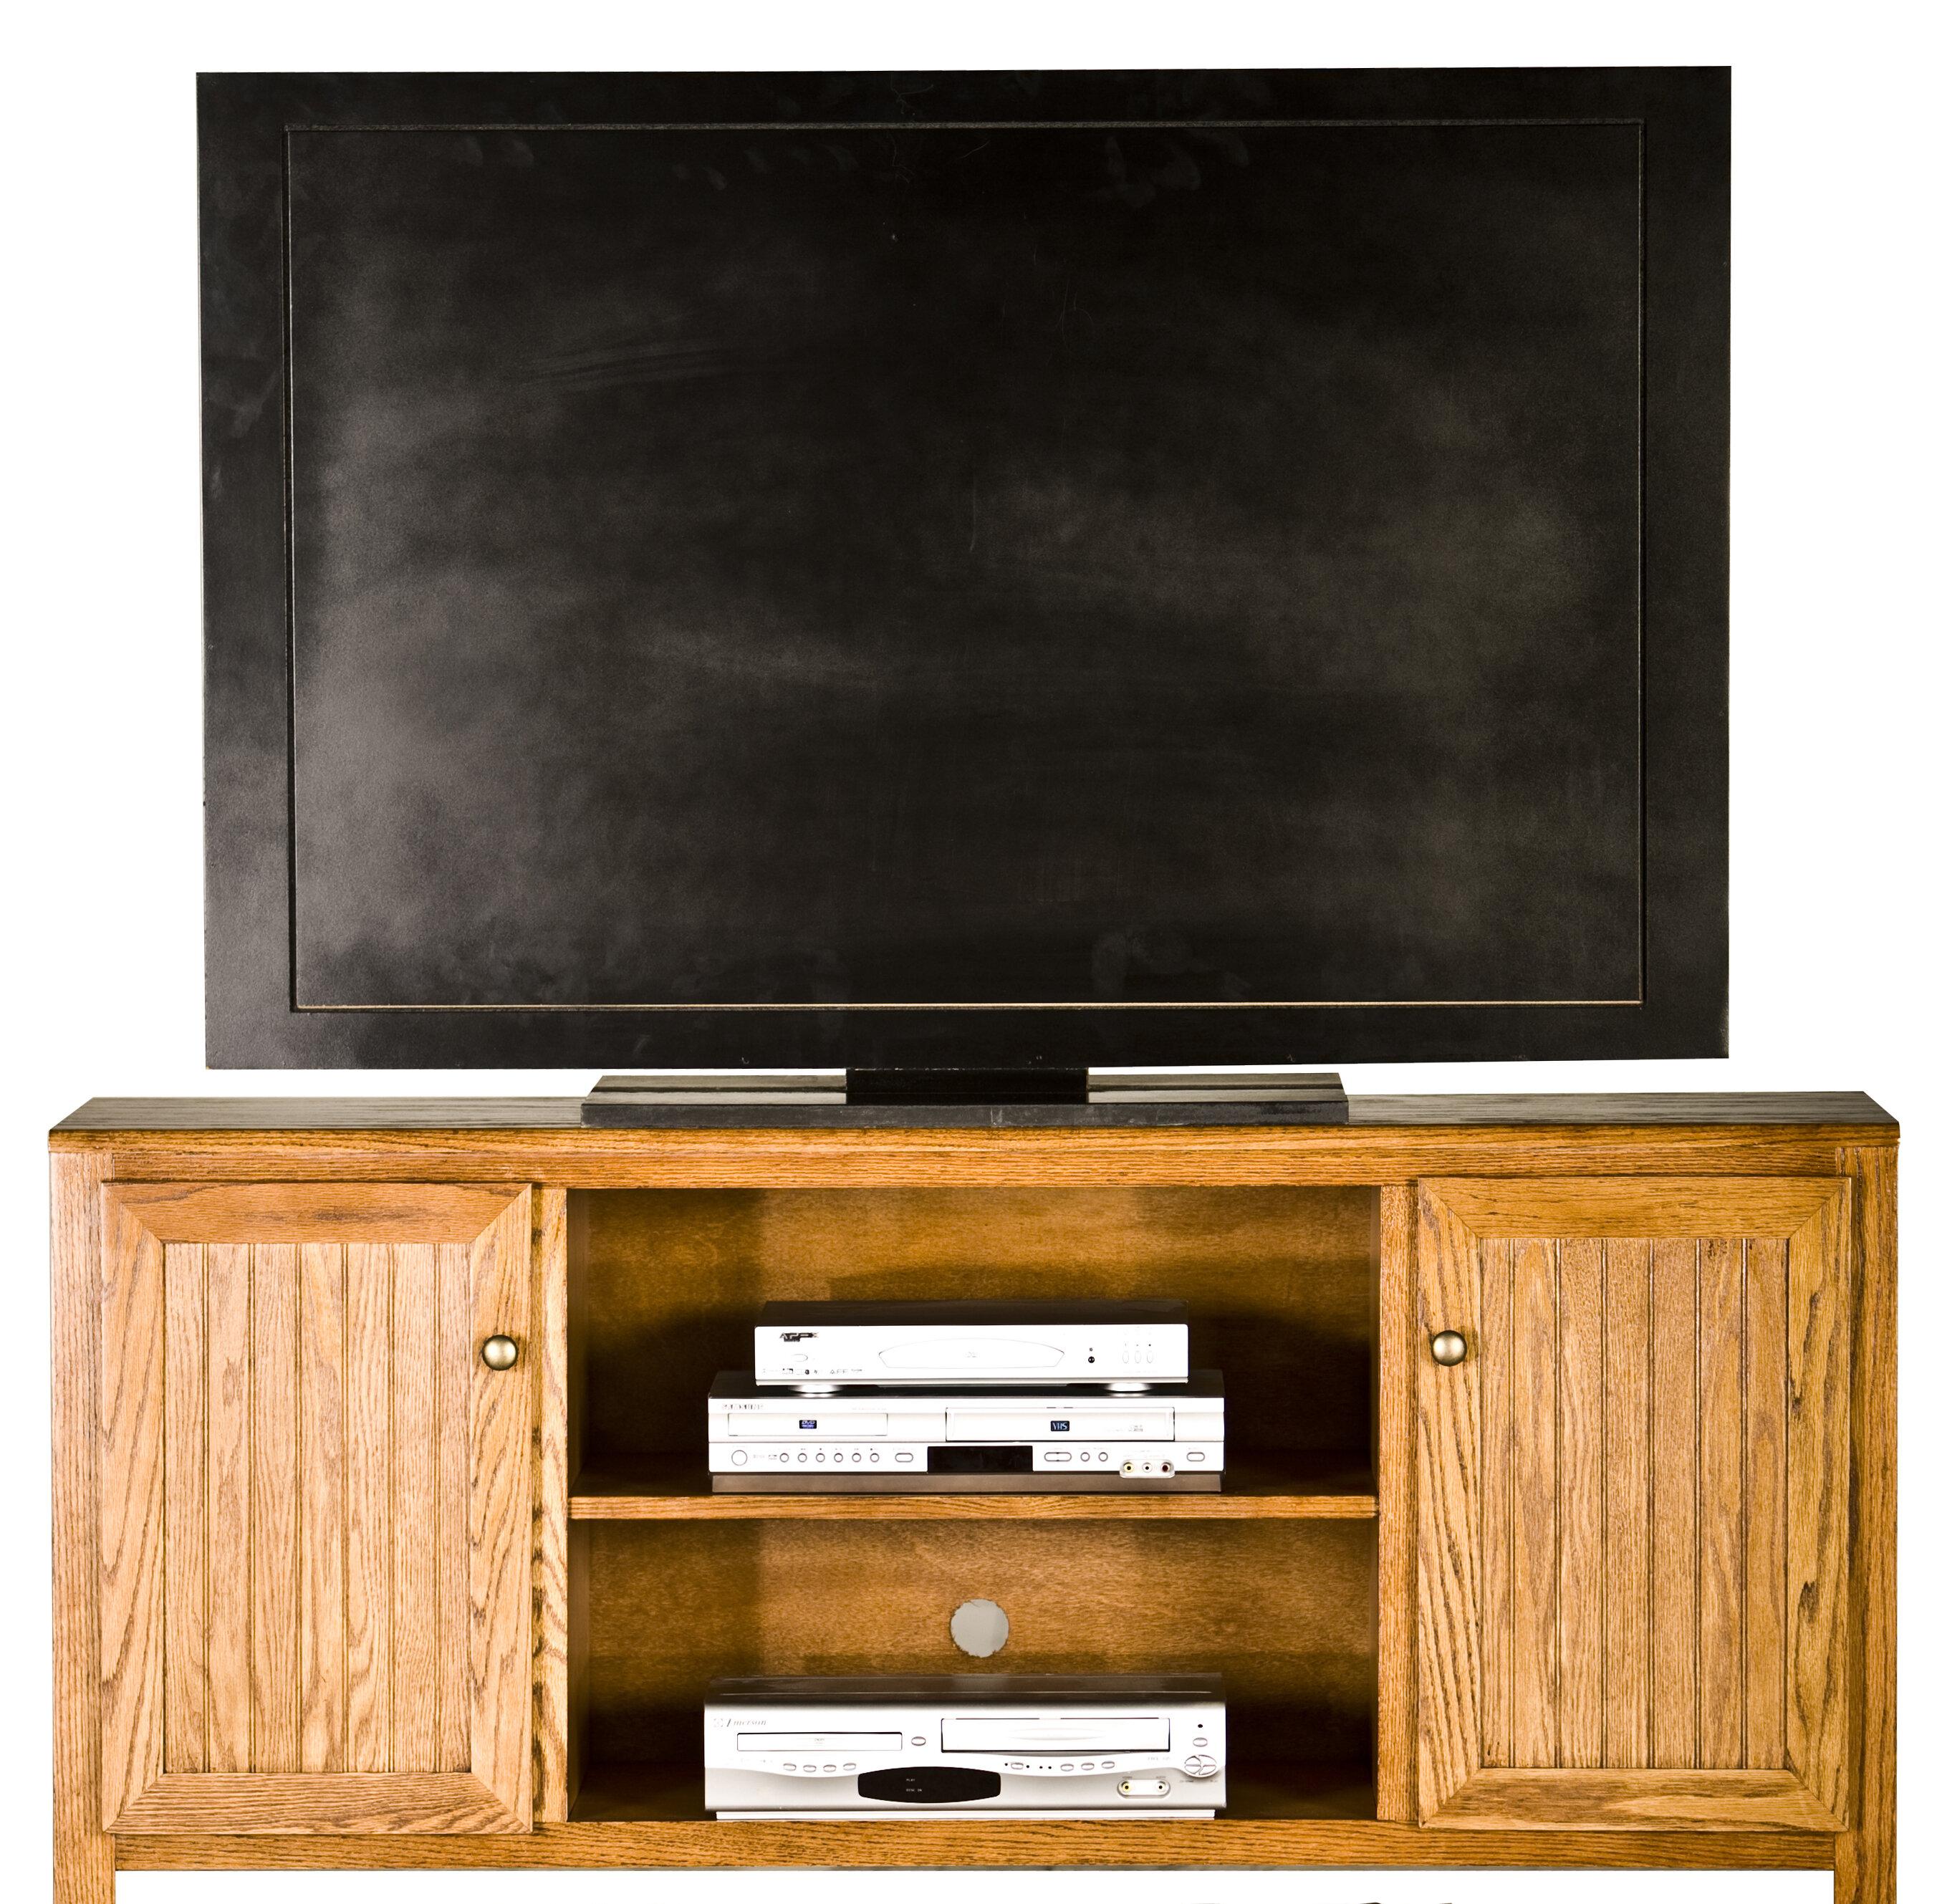 Eagle Furniture Manufacturing Adler Solid Wood Tv Stand For Tvs Up To 48 Wayfair